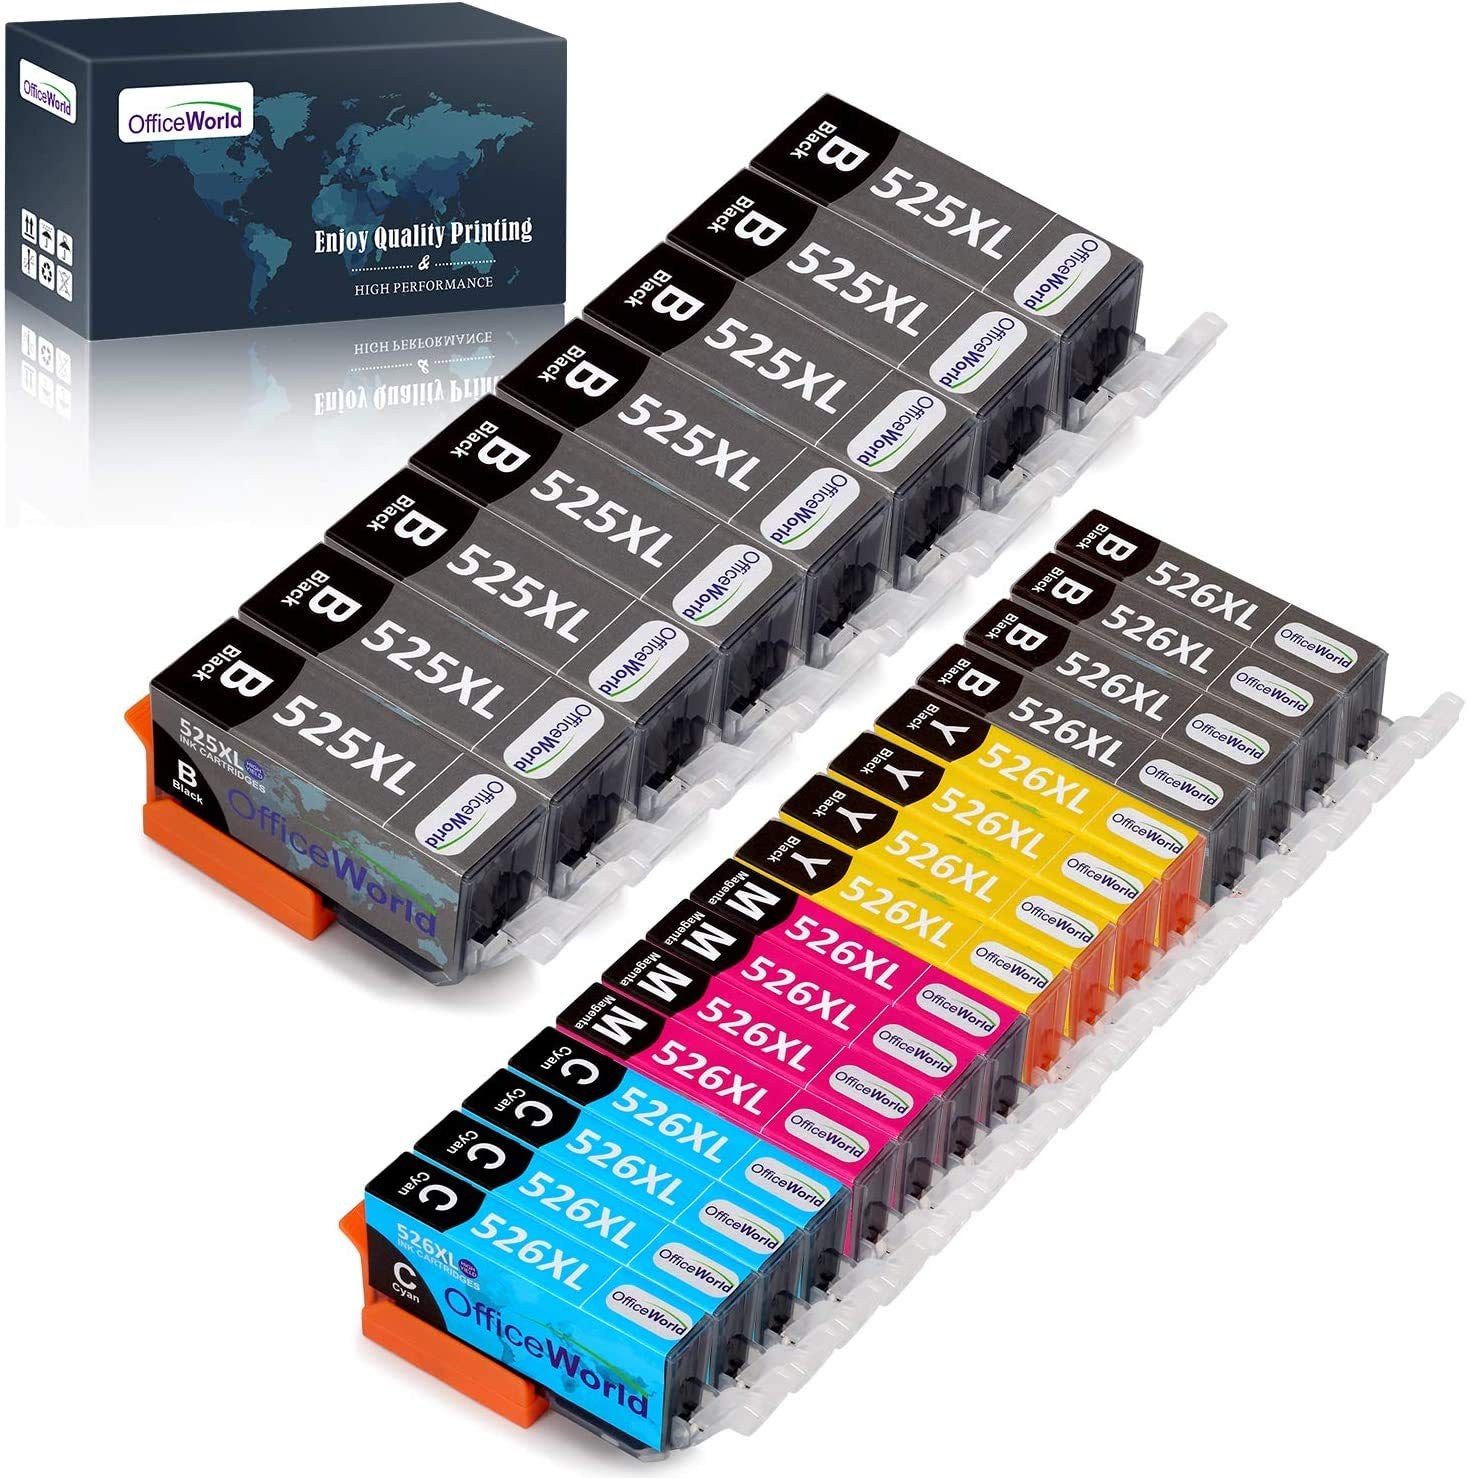 OfficeWorld Replacement for Canon PGI-525 CLI-526 Ink Cartridges PGI-525 XL CLI-526XL Compatible for Canon MG6150 MG6250 MG5350 MG5150 iX6550 MG5250 iP4850 iP4950 MG8150 MG8250 MX885 MX895 MX715